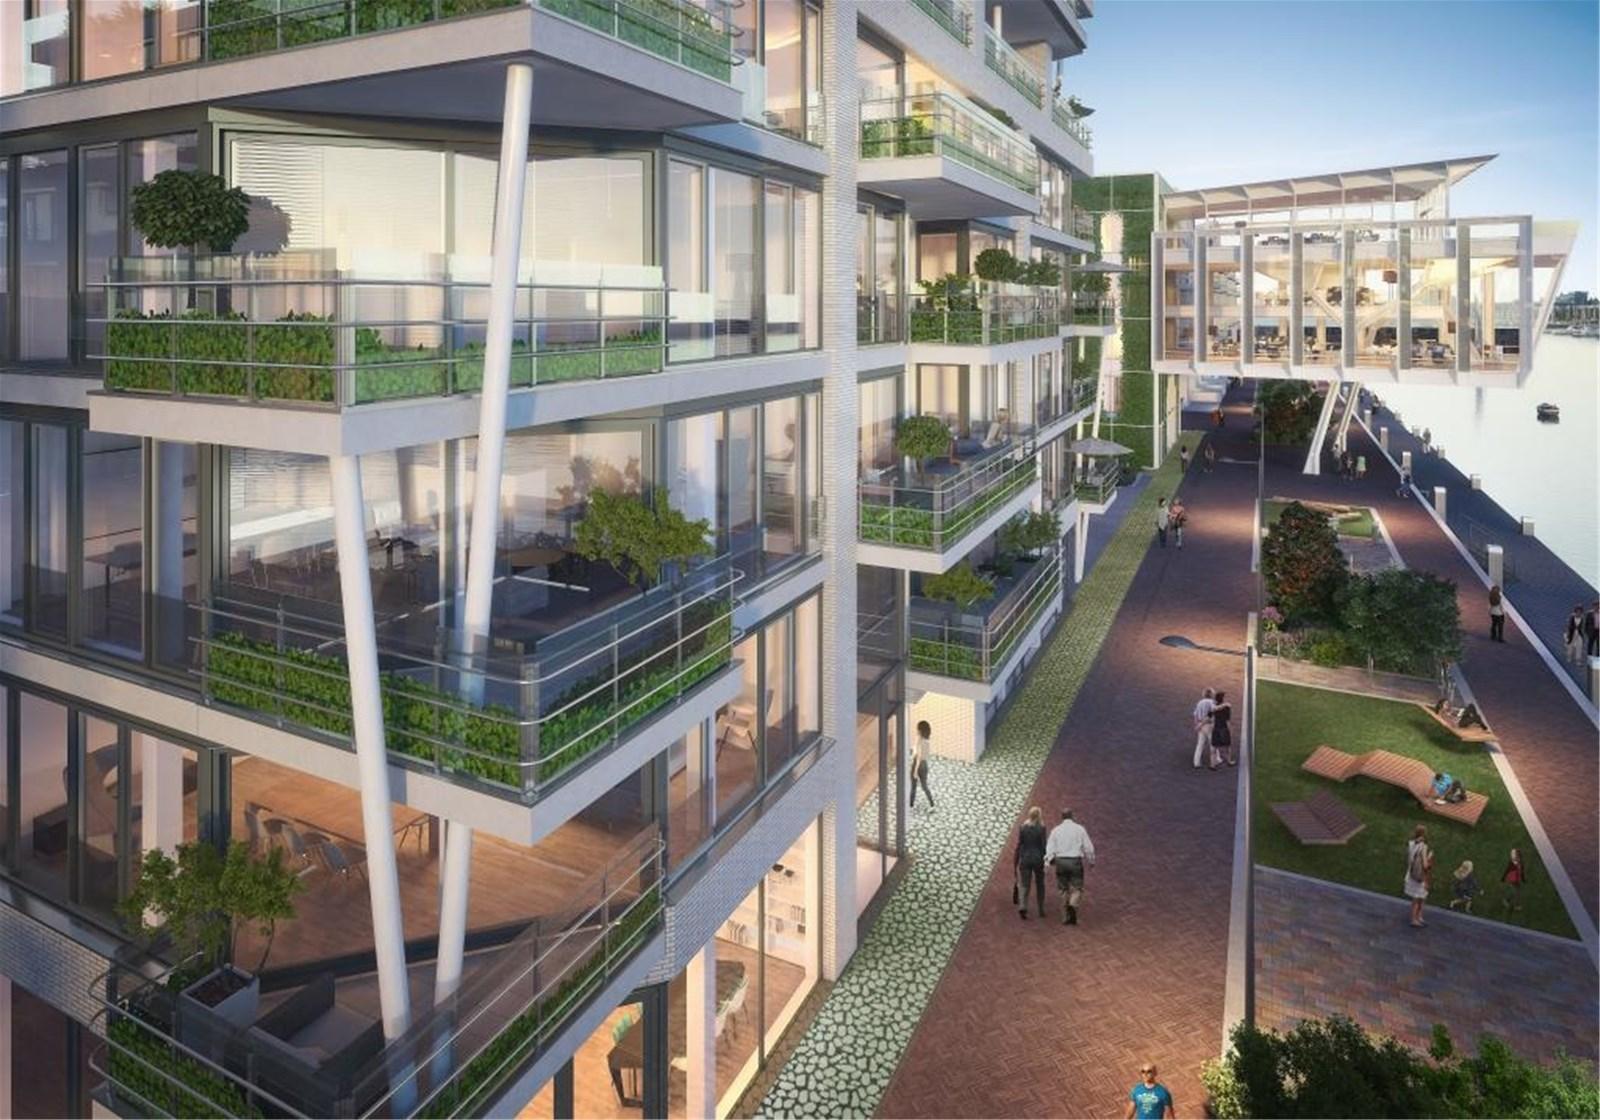 Nieuwbouw project Cruquius 1.2 van - Makelaarsvereniging Amsterdam MVA